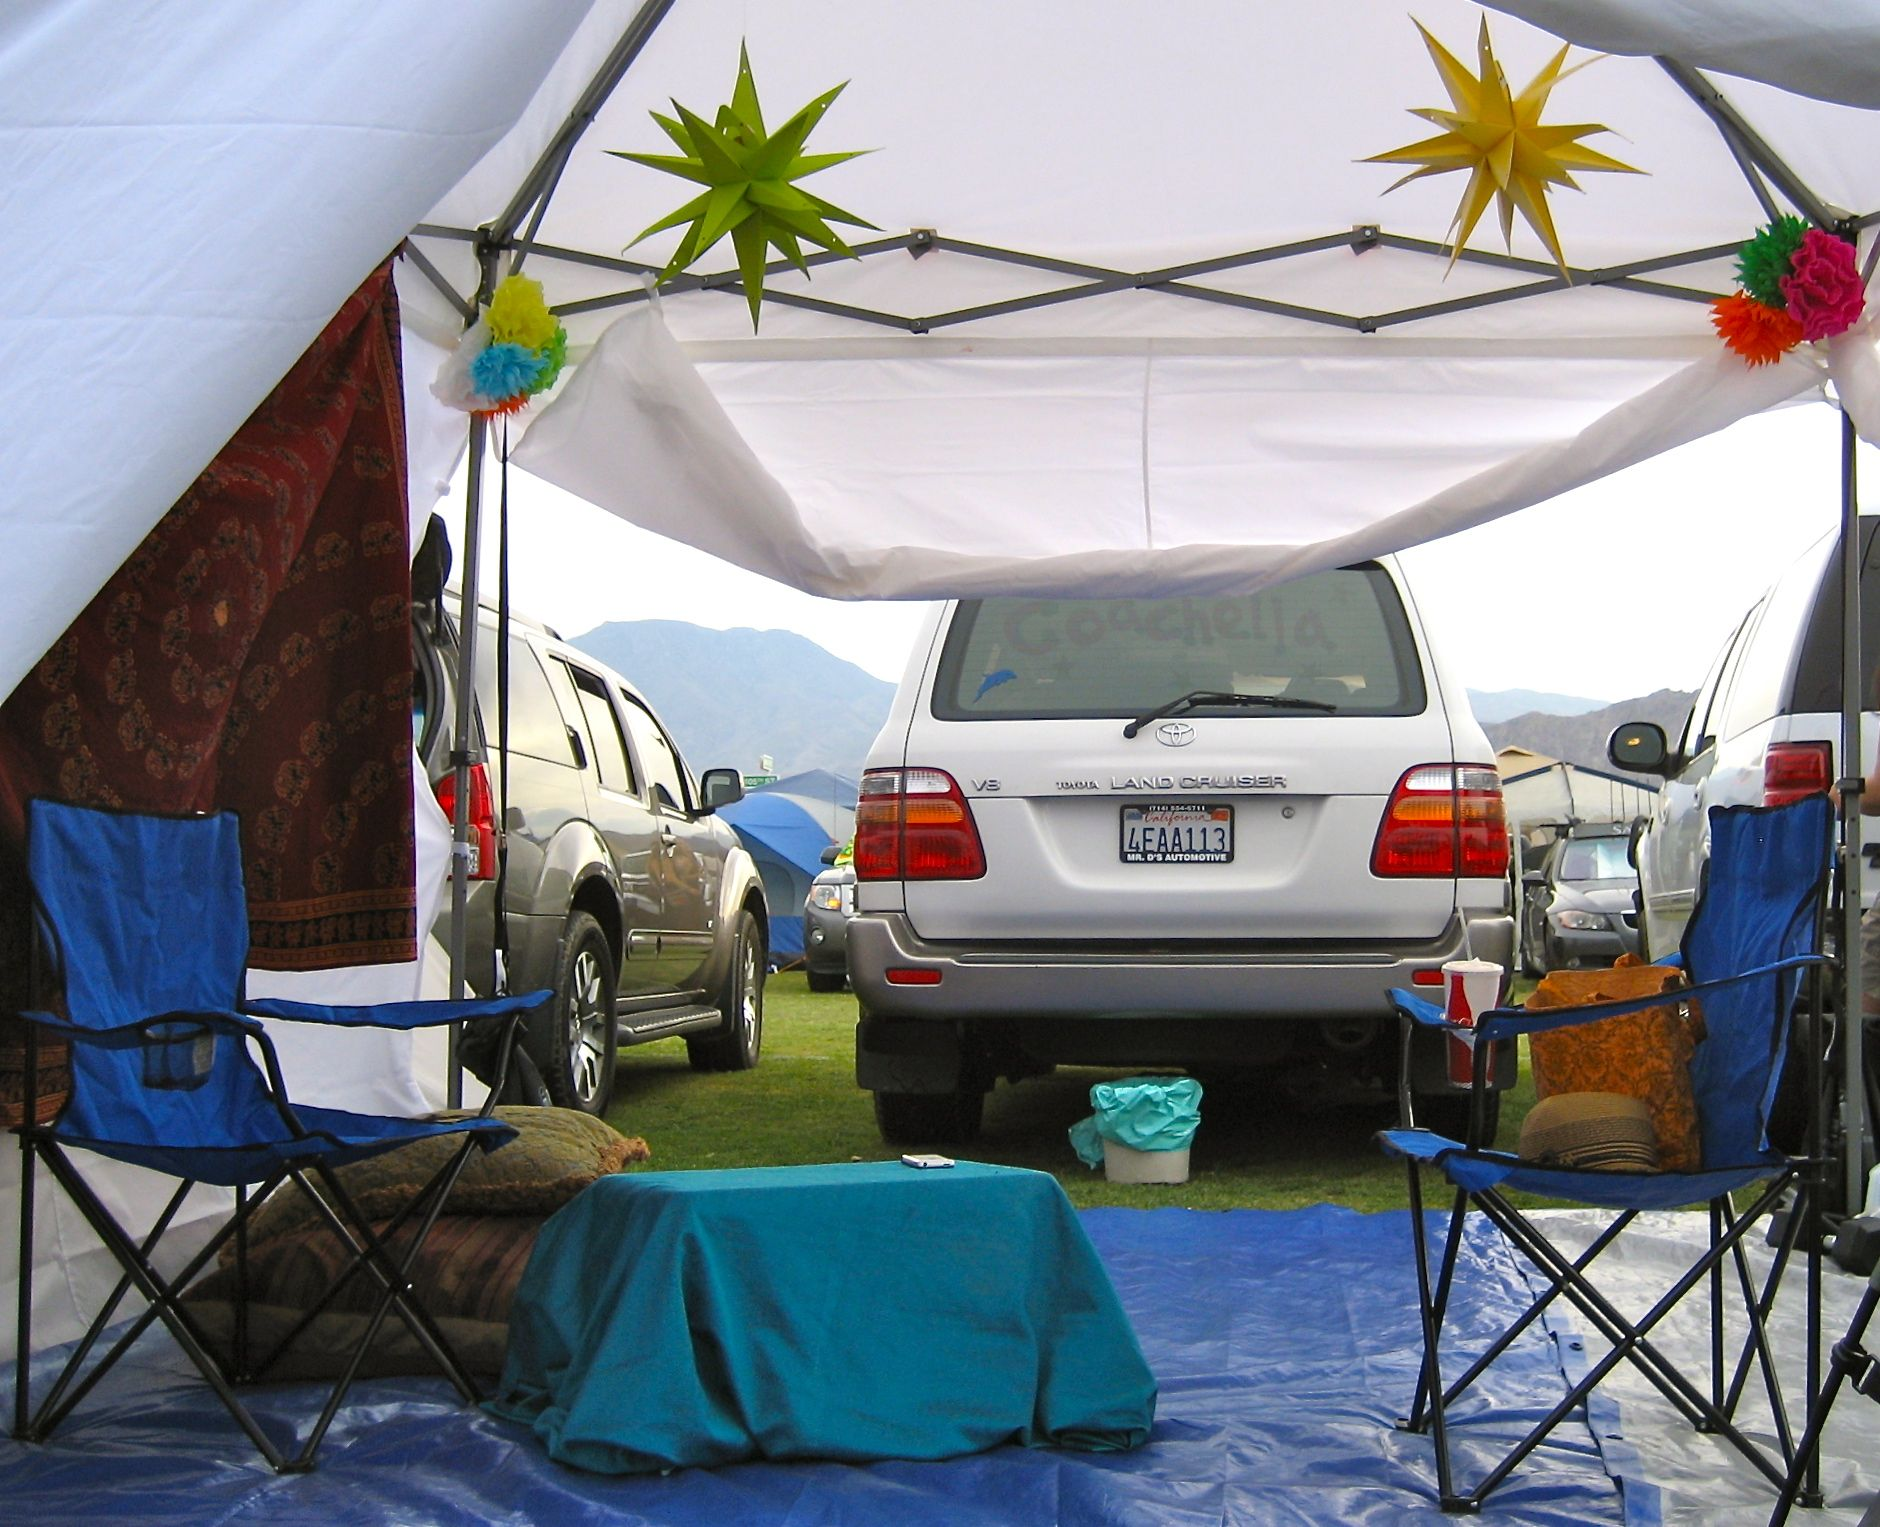 estrella camp / coachella | Coachella | Coachella car